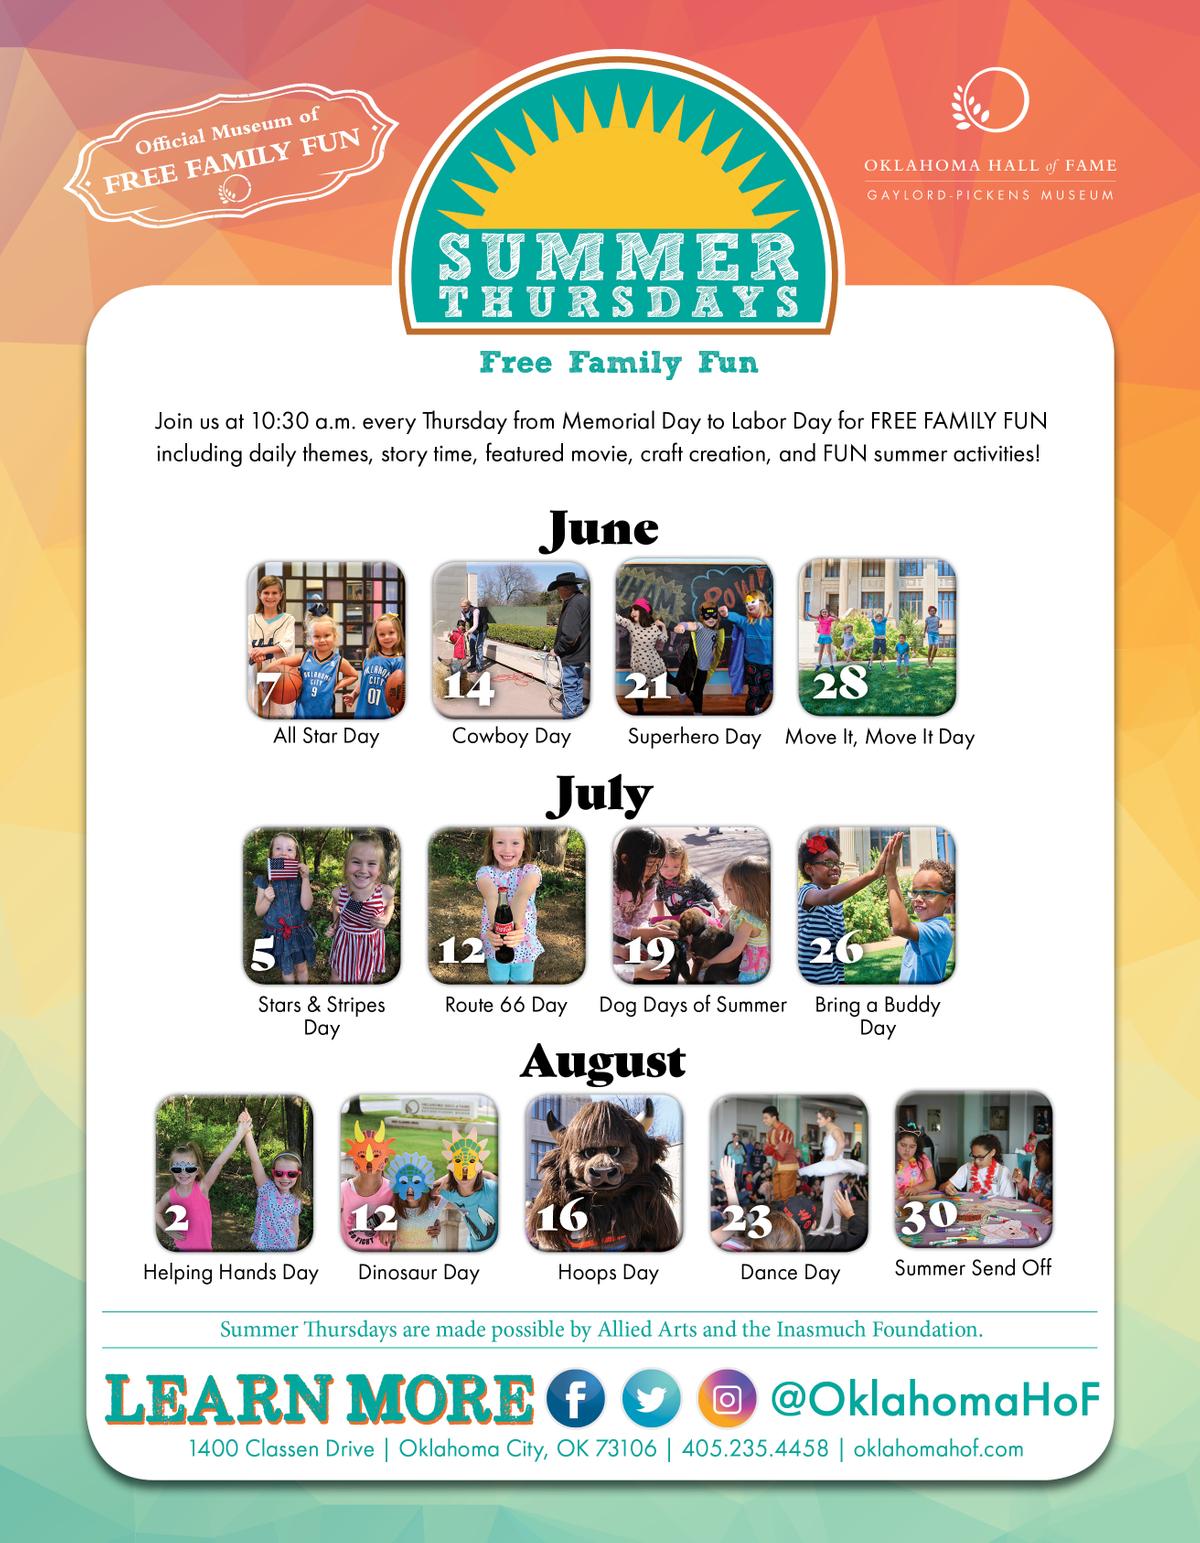 Summer Thursdays 2018 Flyer_Full Calendar.jpg